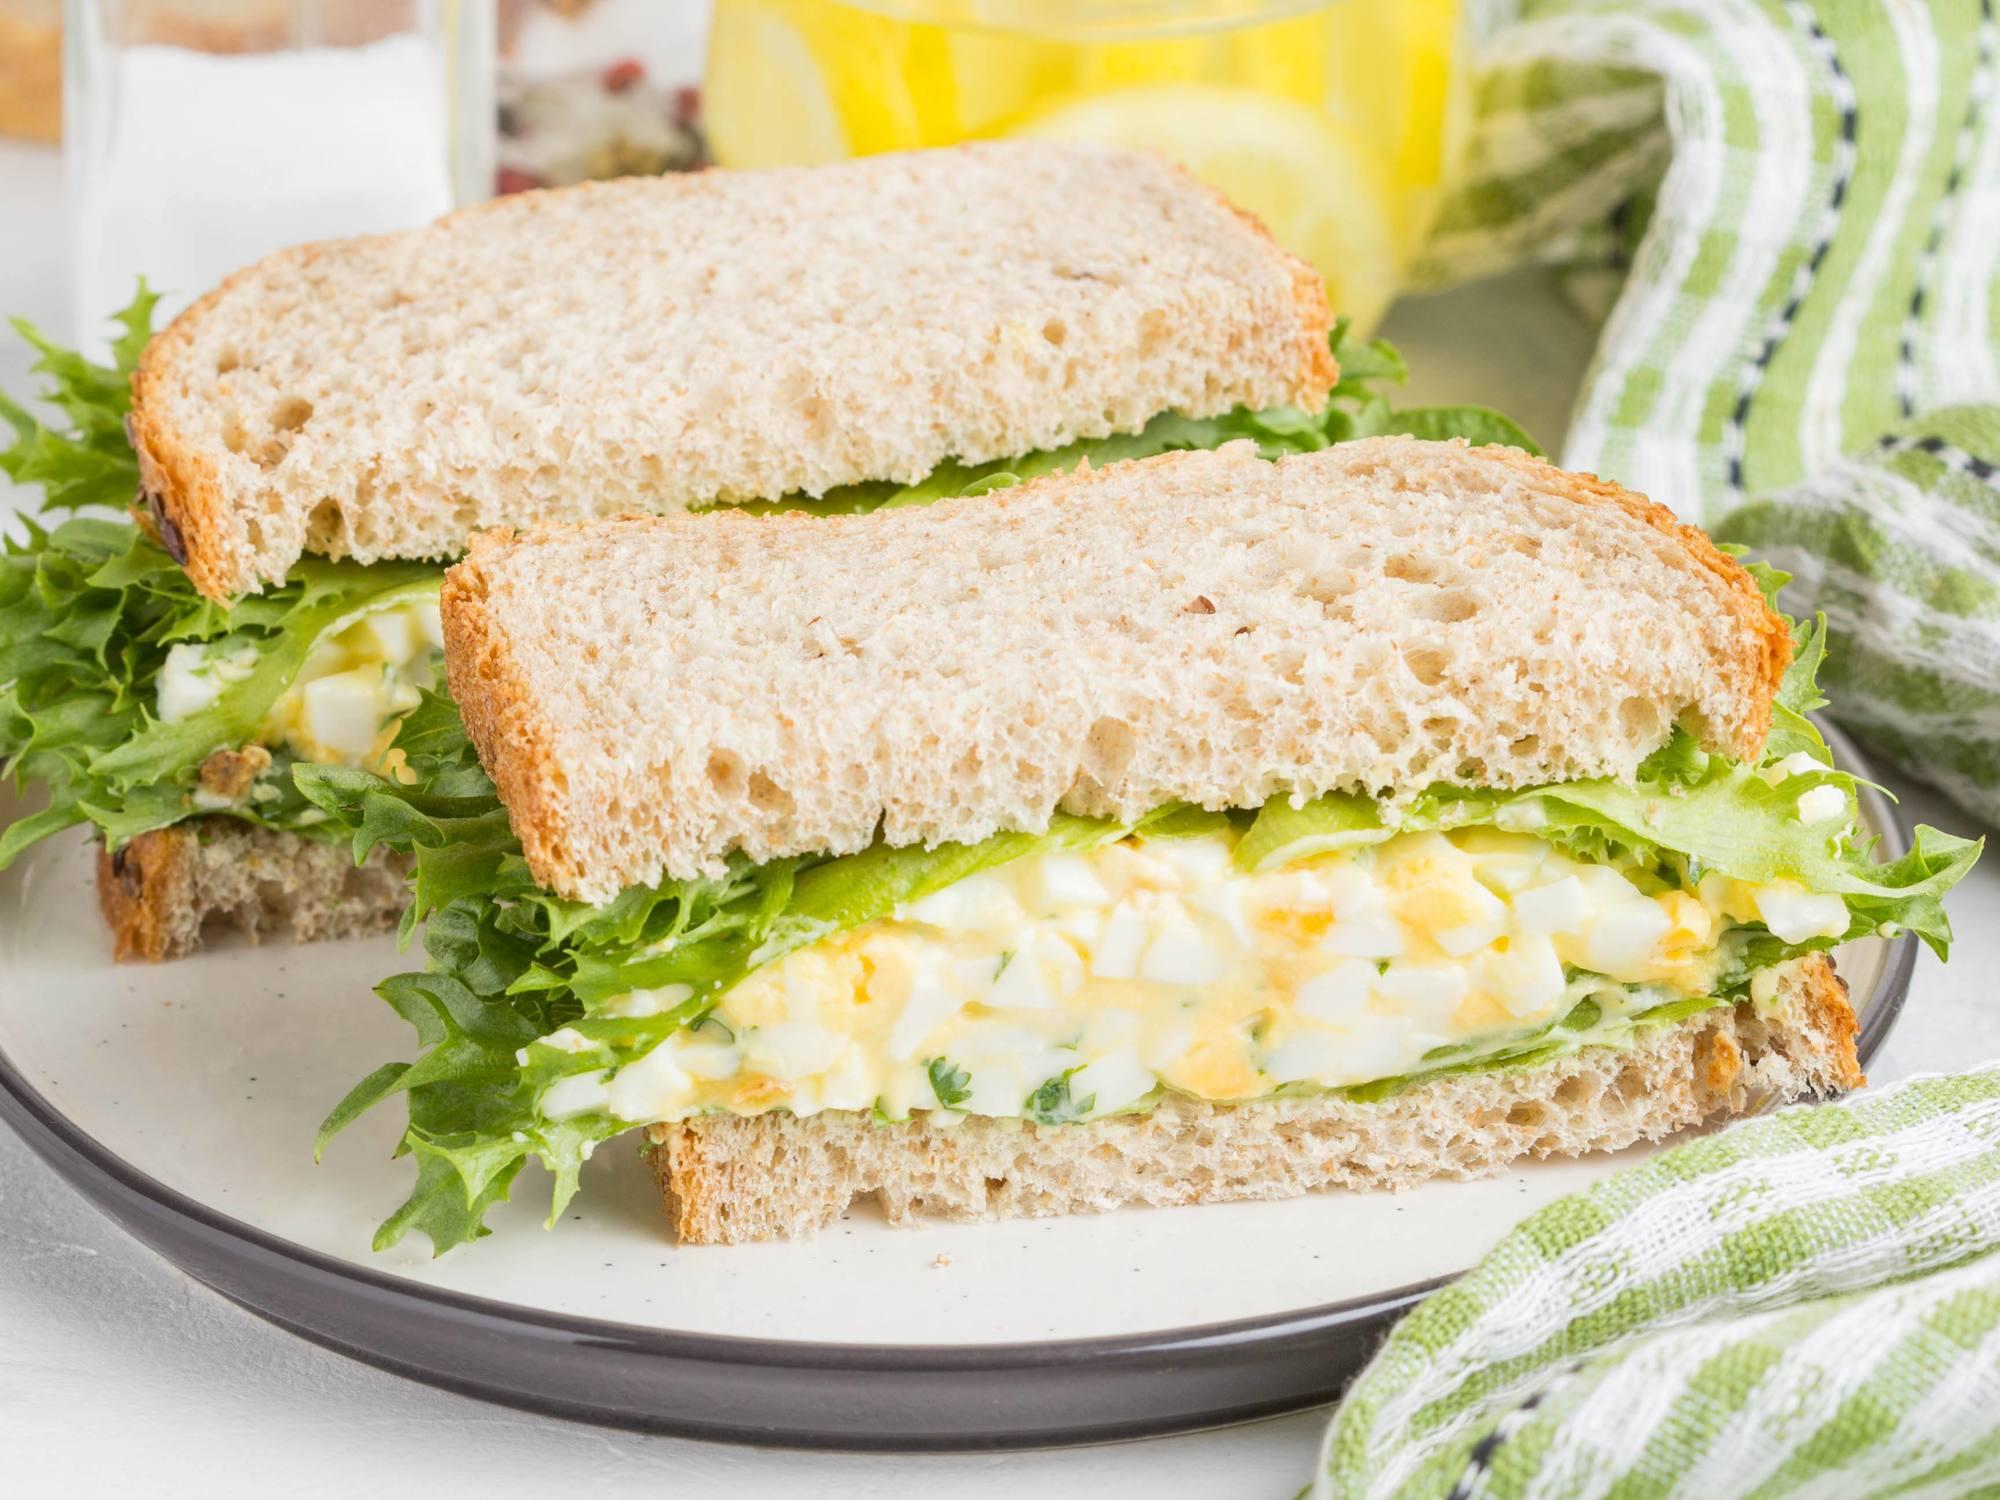 Classic Egg Mayo Sandwich